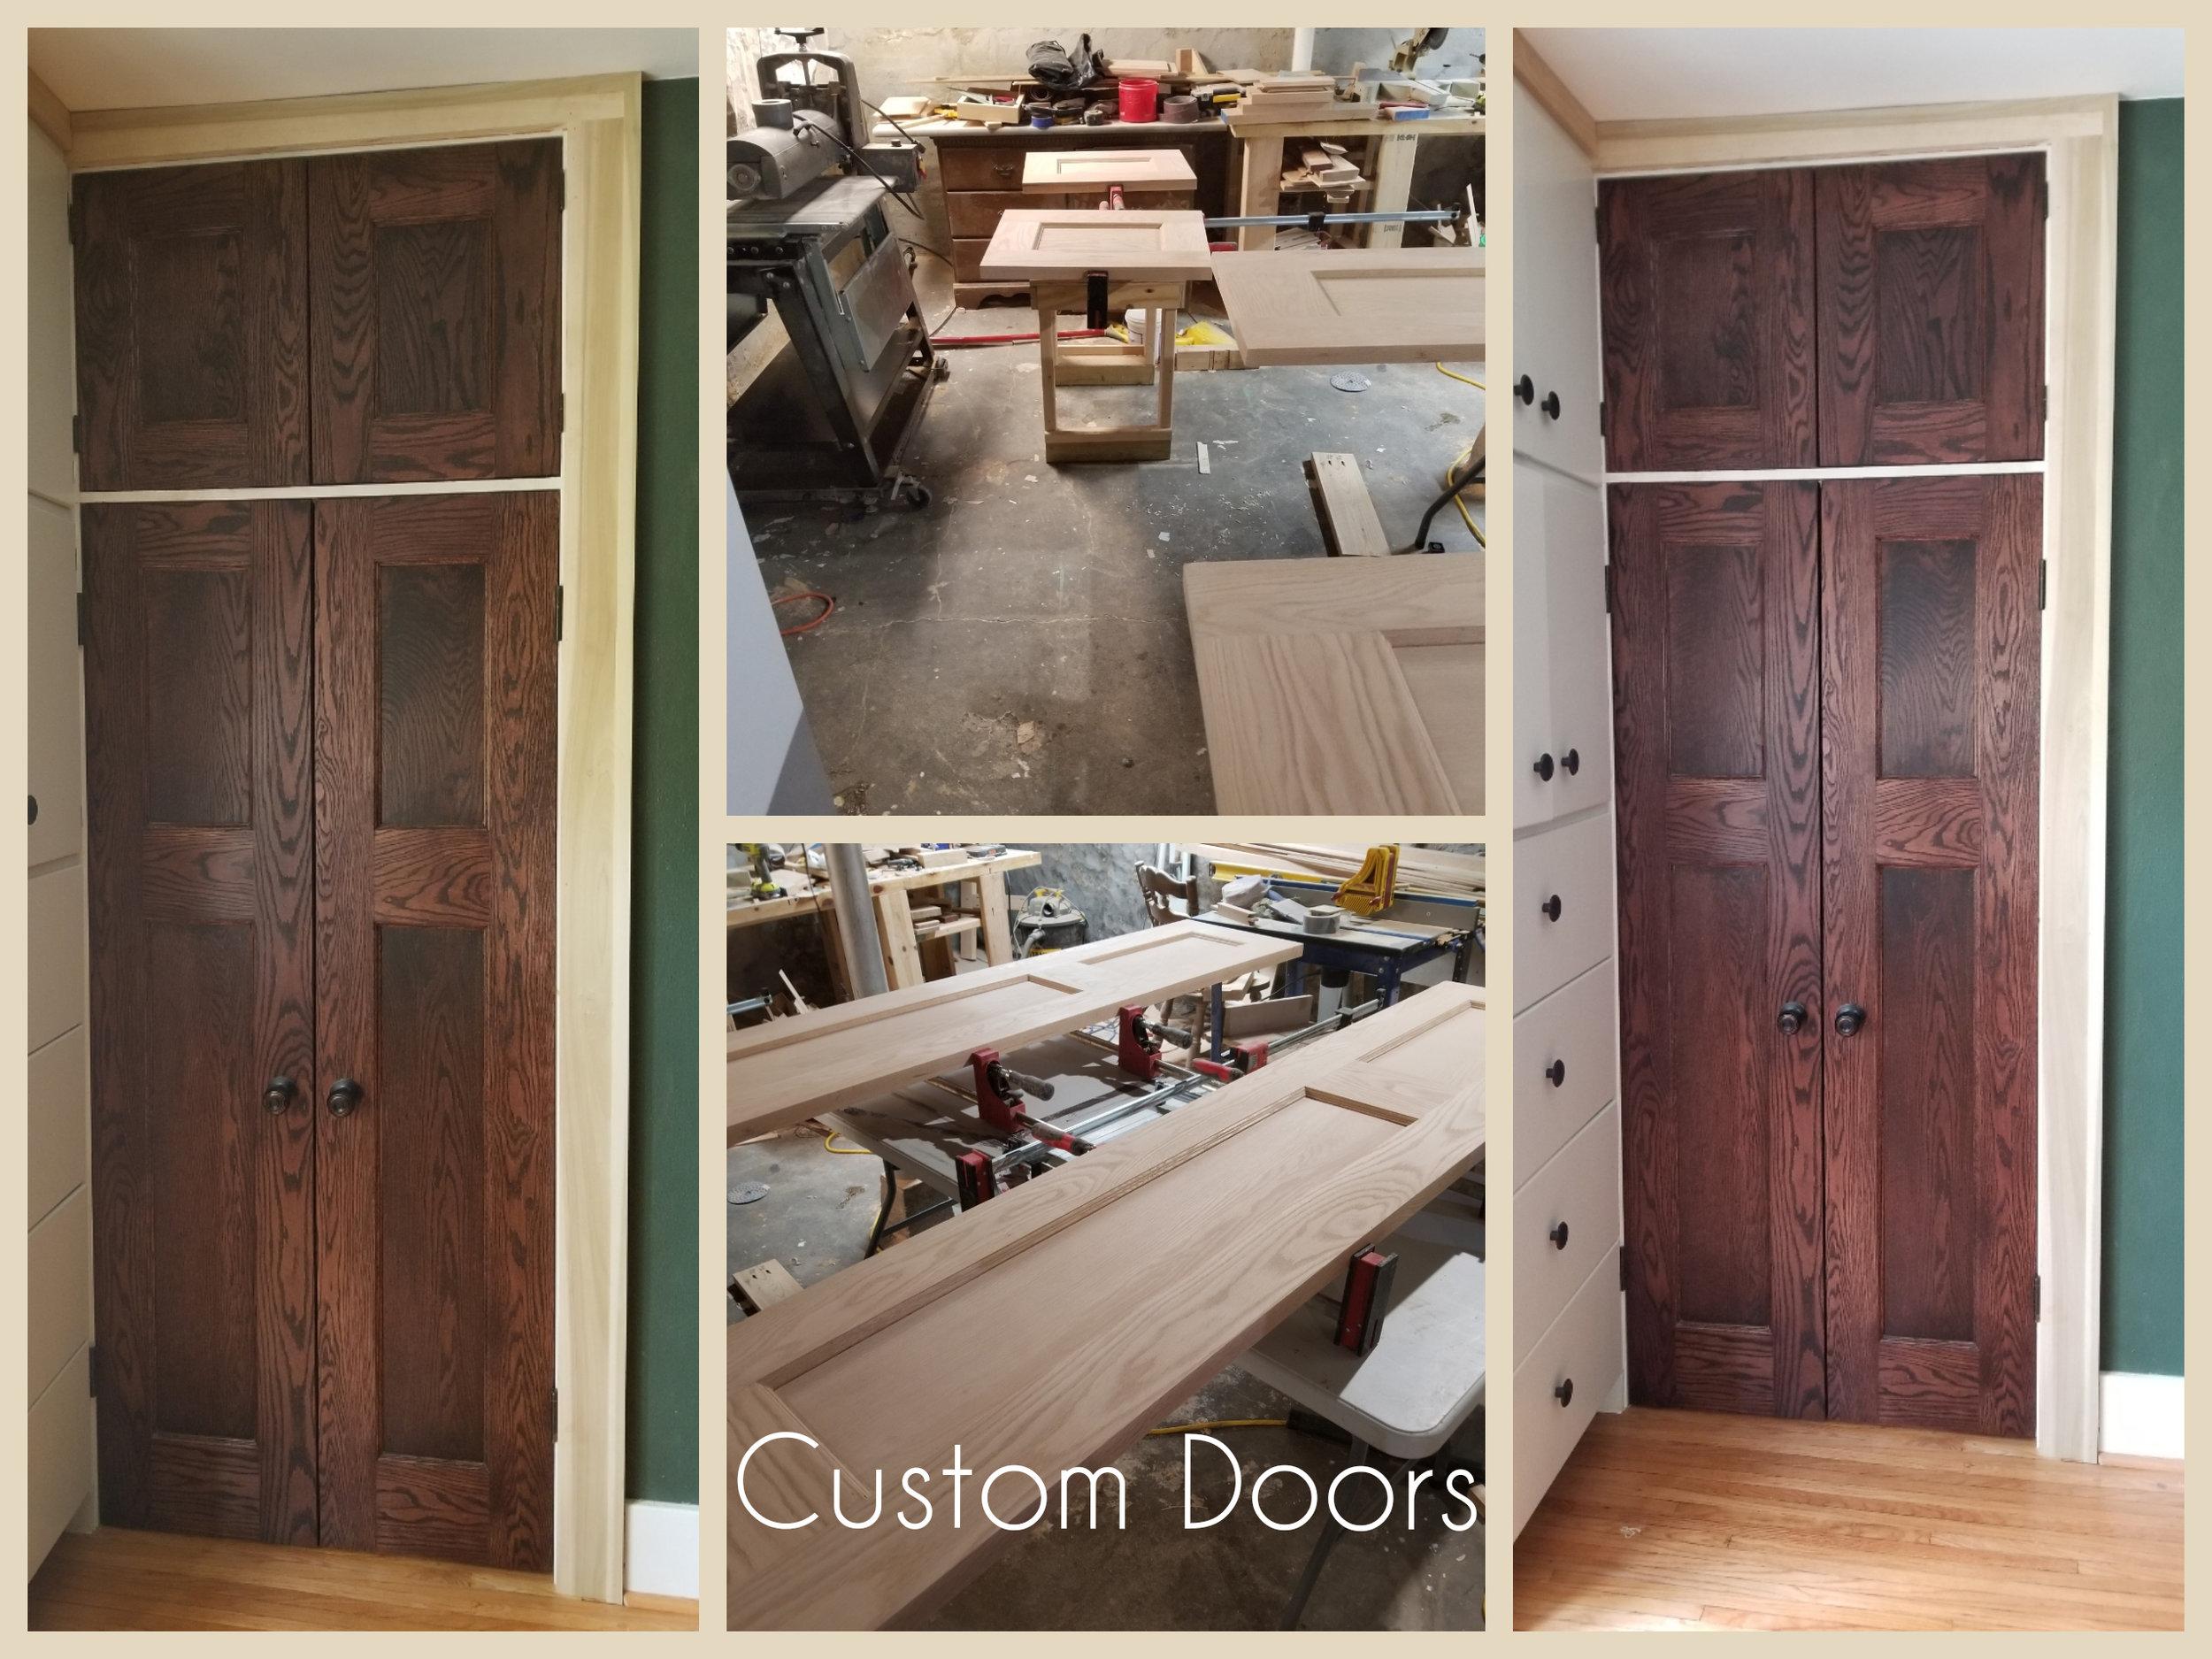 Custom Doors - pantry, closet, bedroom etc…